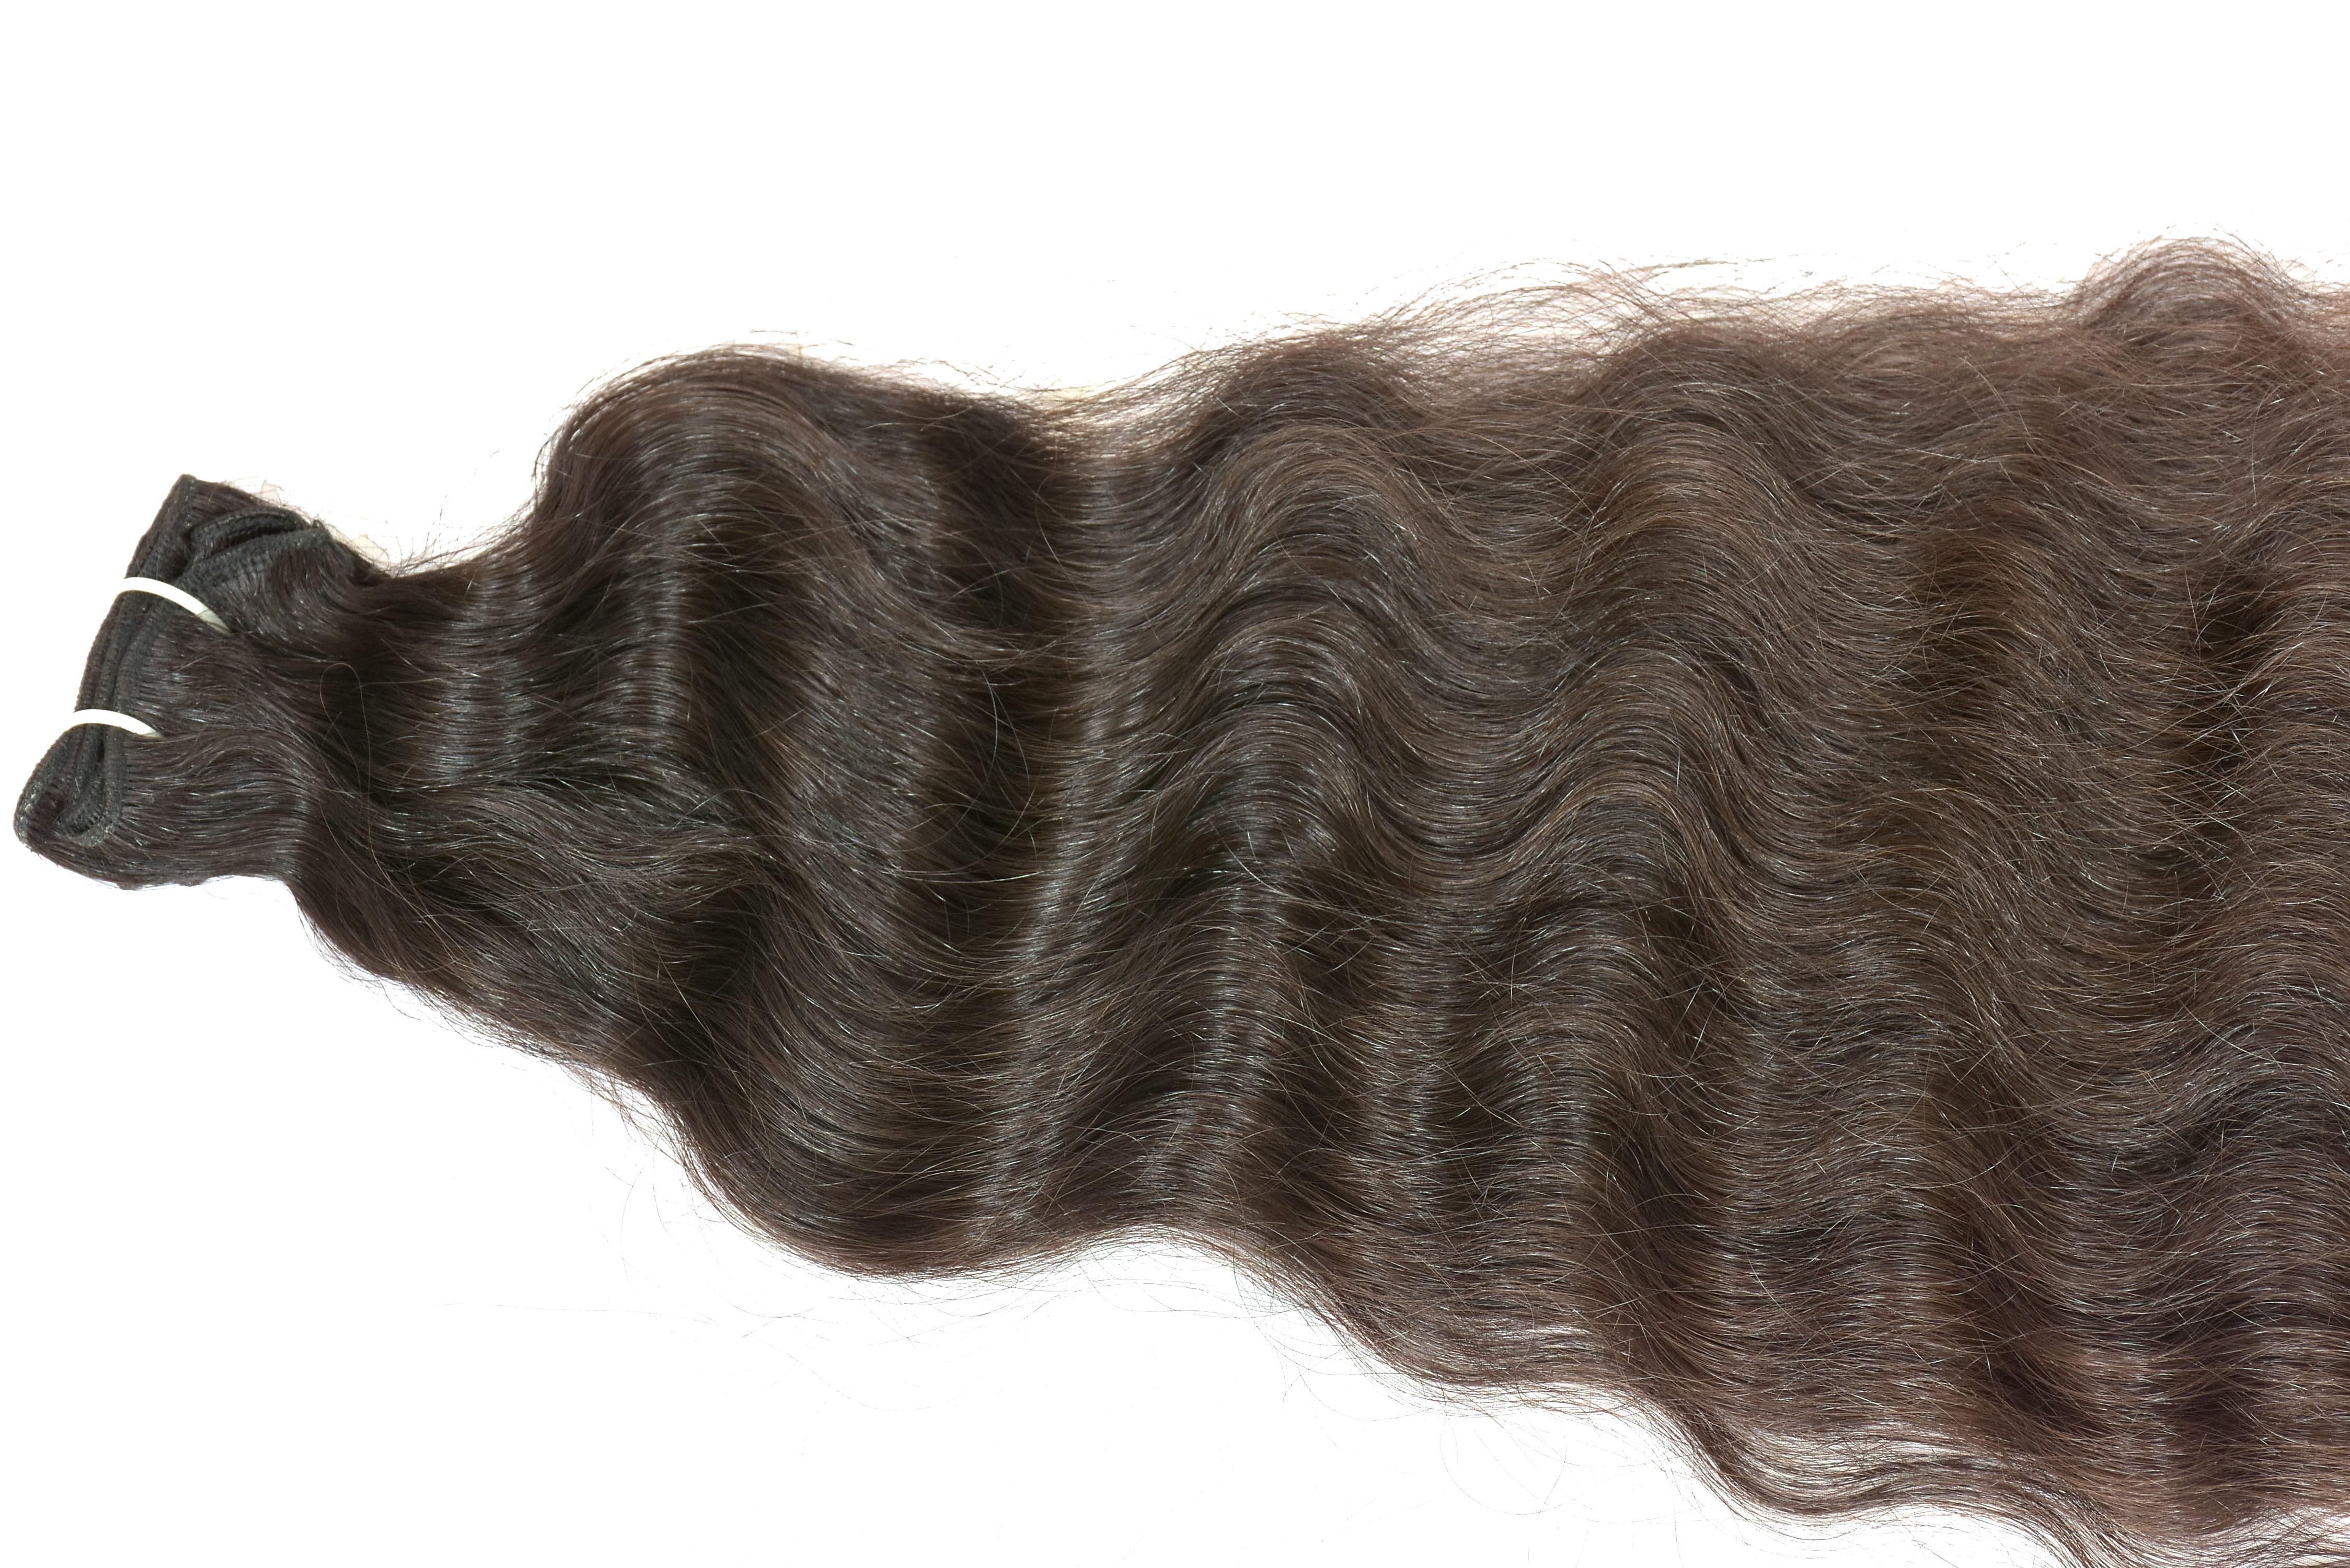 Human Hair Manufacturerhuman Hair Exporter By Shree Ganesh Indian Hair